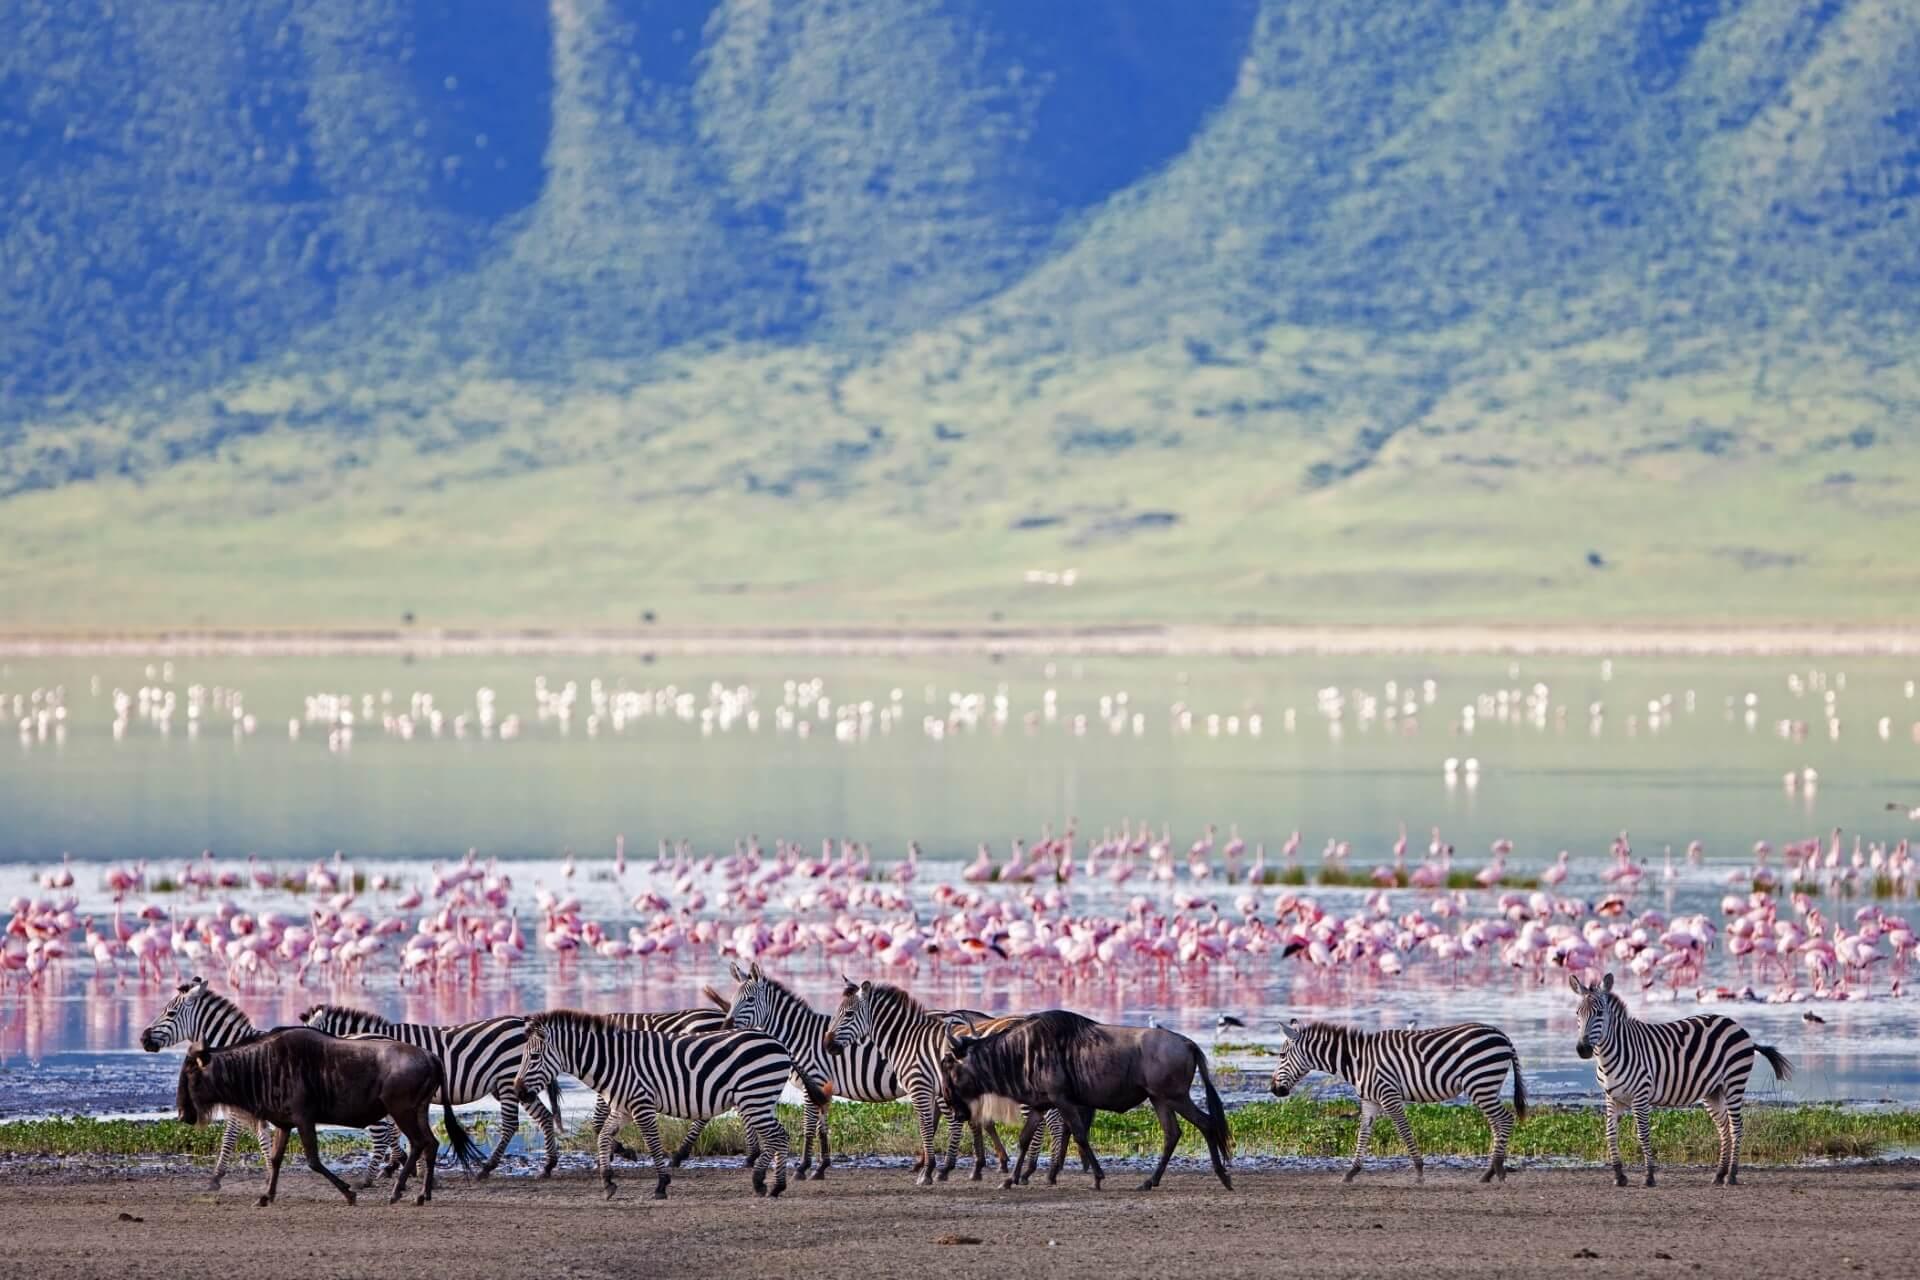 Ngorongoro Crater_Zebras Gnus